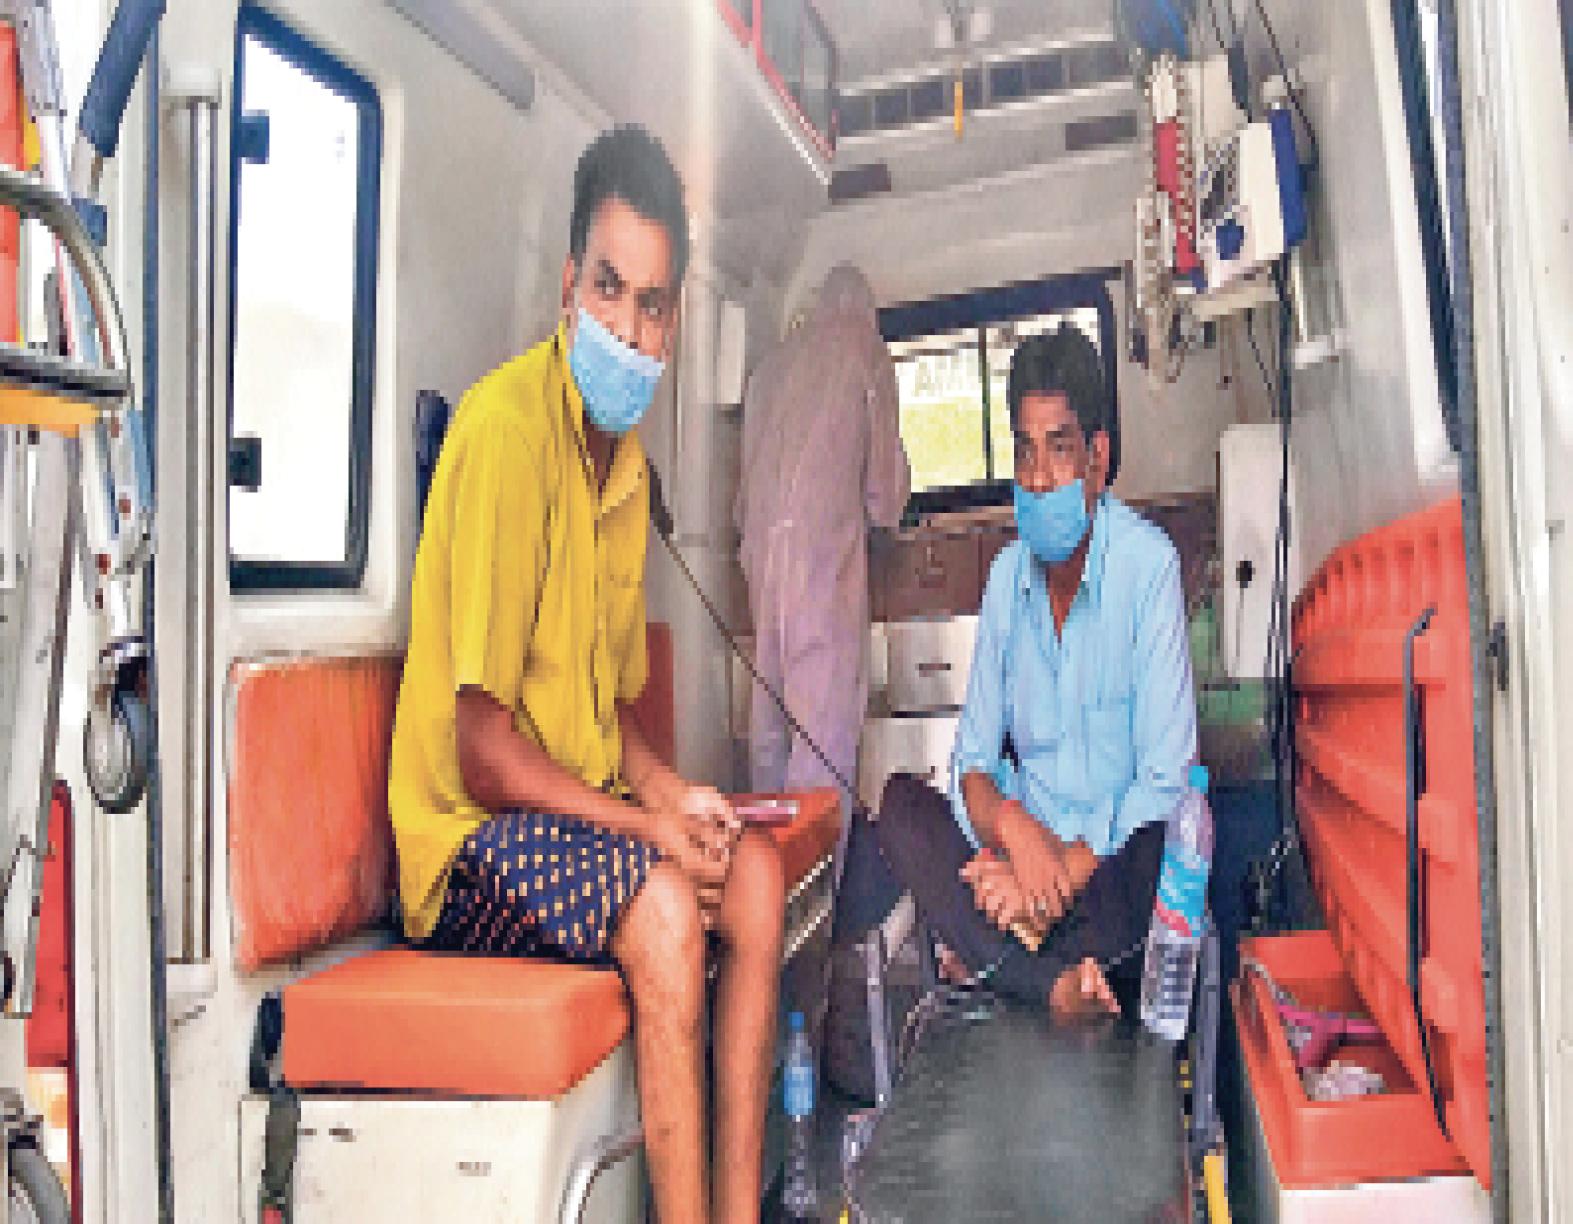 ज्यादातर निजी अस्पतालों में बेड फुल, सरकारी में सिर्फ 30 रिजर्व बेड ही खाली|रांची,Ranchi - Dainik Bhaskar